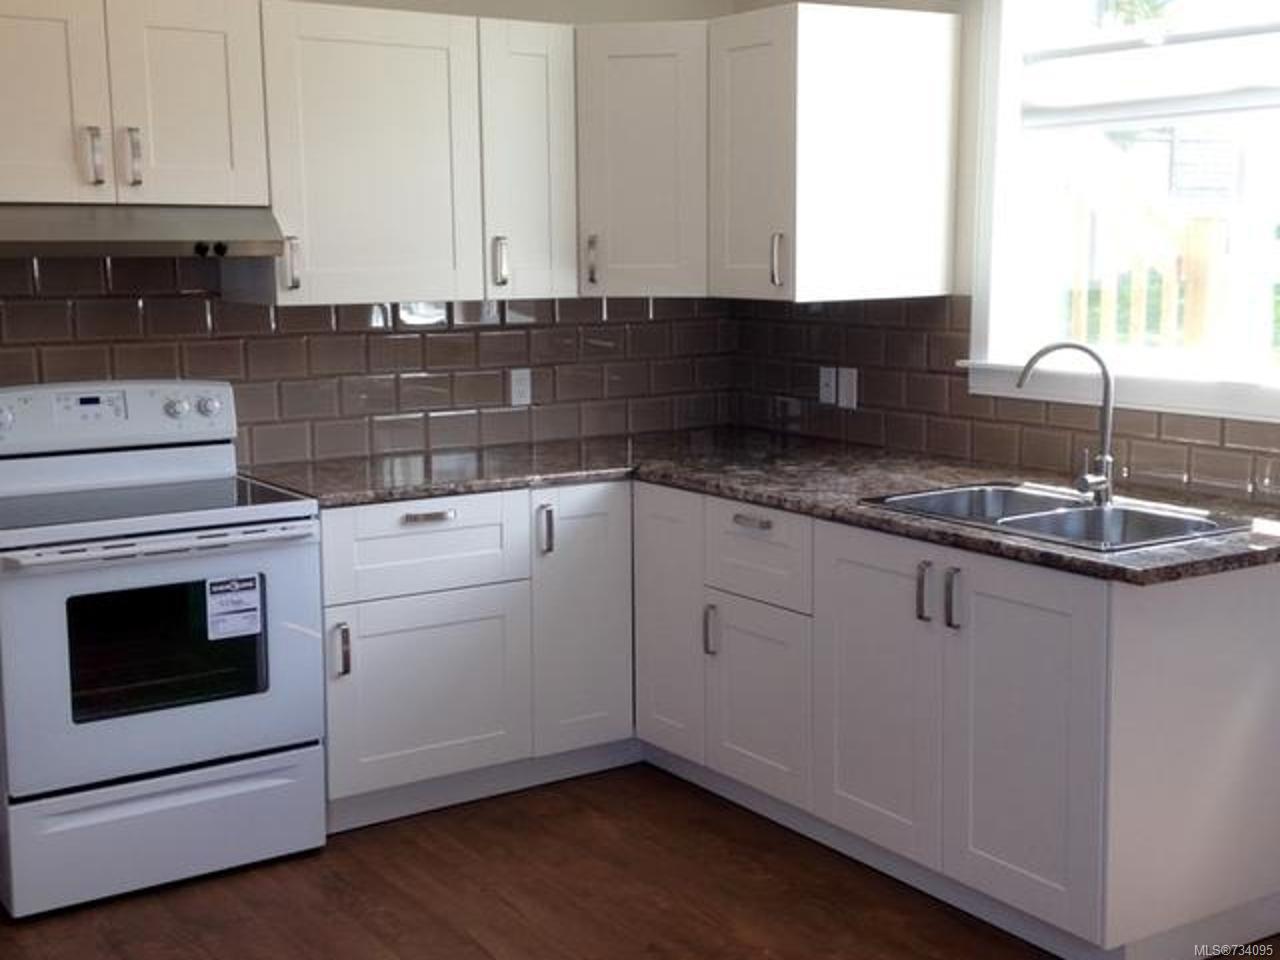 Photo 23: Photos: 189 Strathcona Way Campbell River Real Estate Properties British Columbia Remax Check Realty